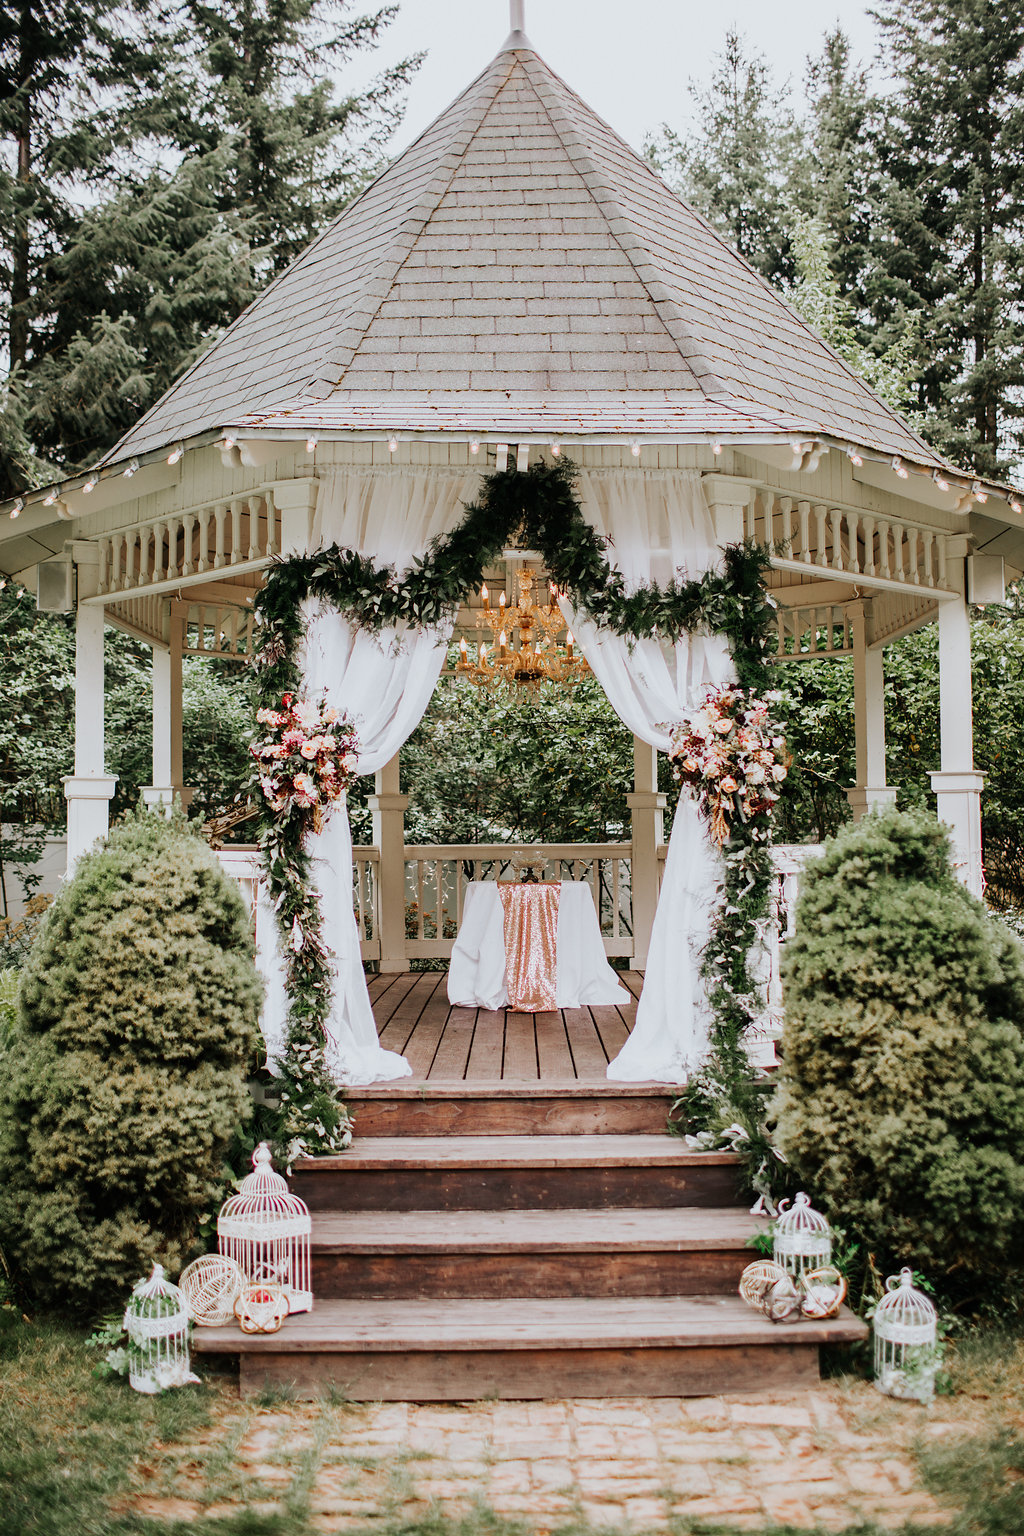 gazebo wedding venues - https://ruffledblog.com/glam-autumn-wedding-at-belle-gardens